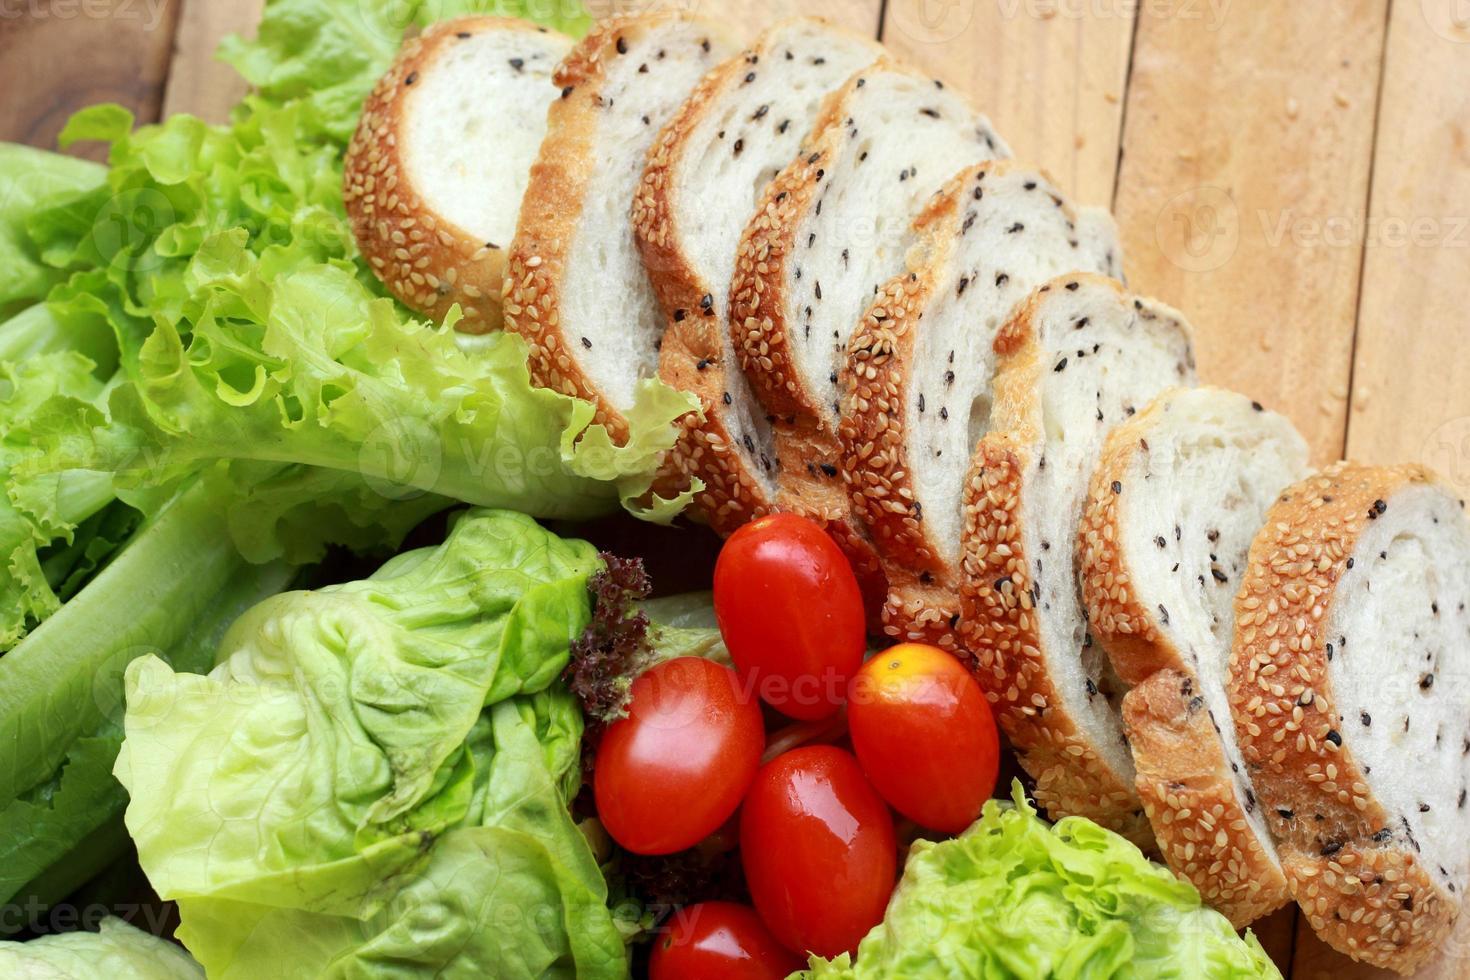 bread sprinkled with sesame -  vegetable green salad photo